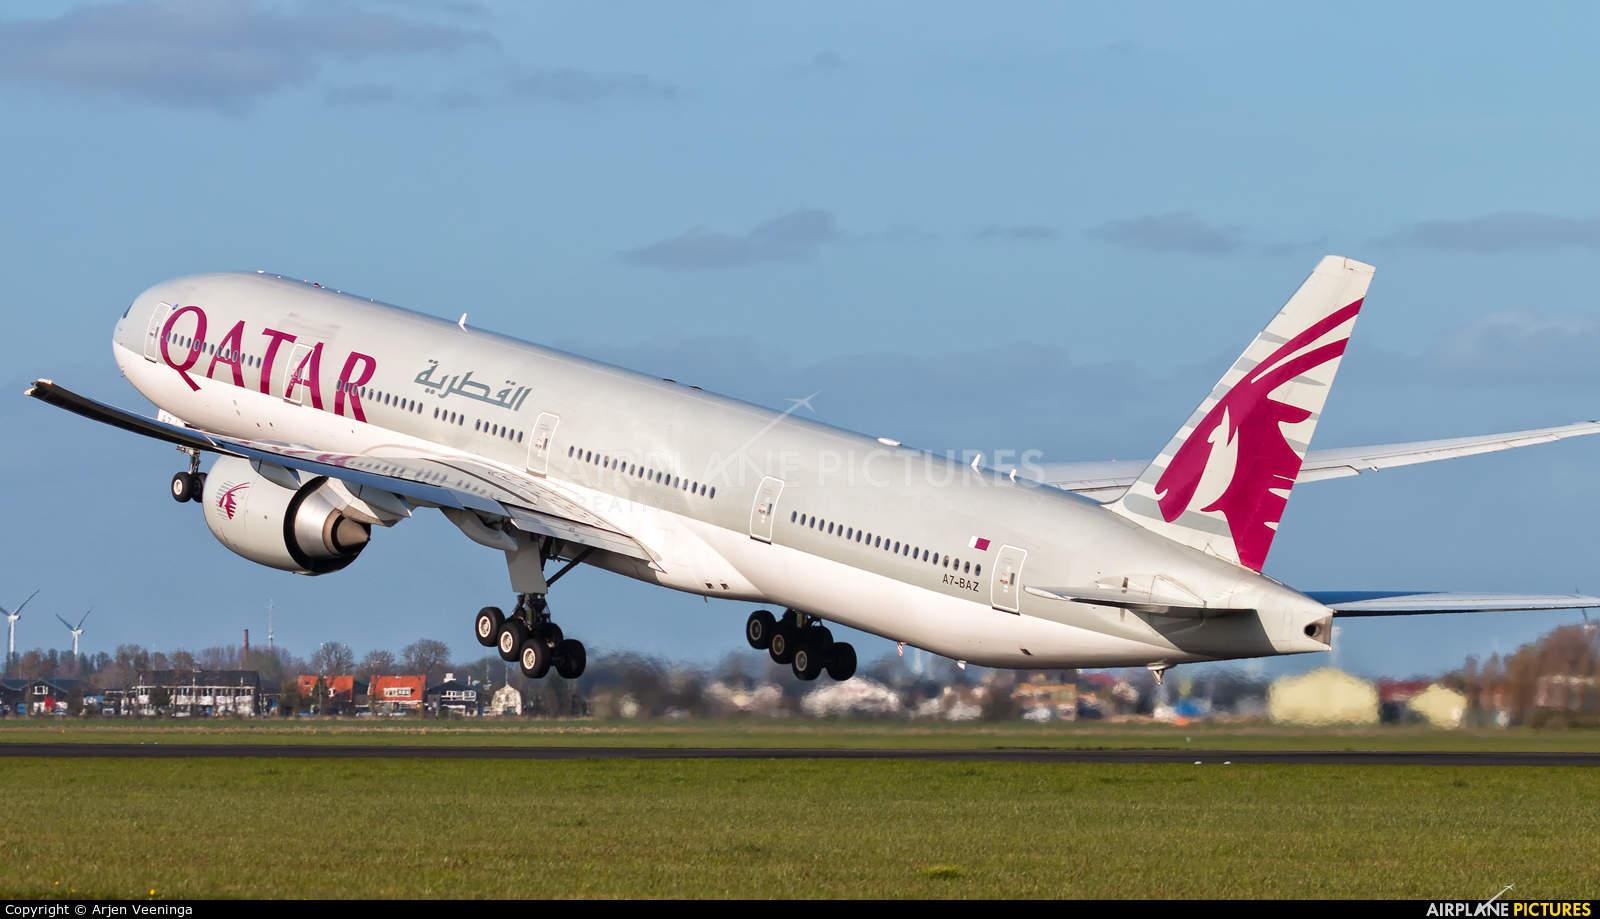 Qatar Airways launches daily flight to Las Vegas